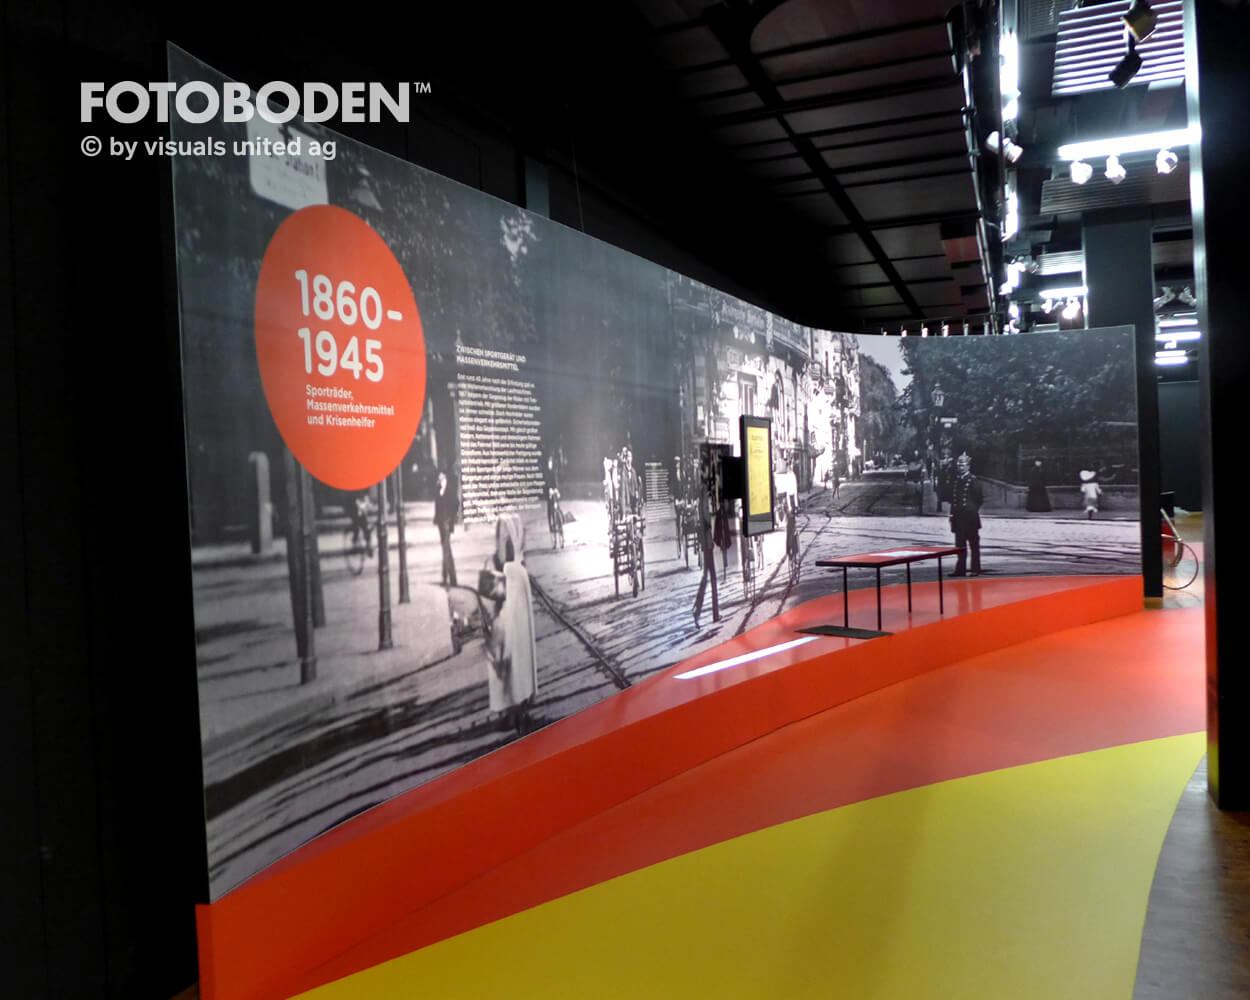 Fahrrad3 Ausstellung Museum  Raumkonzept Stimmung Museumsboden Ausstellungsboden Fotoboden Vinylboden Flooring Individuell Event